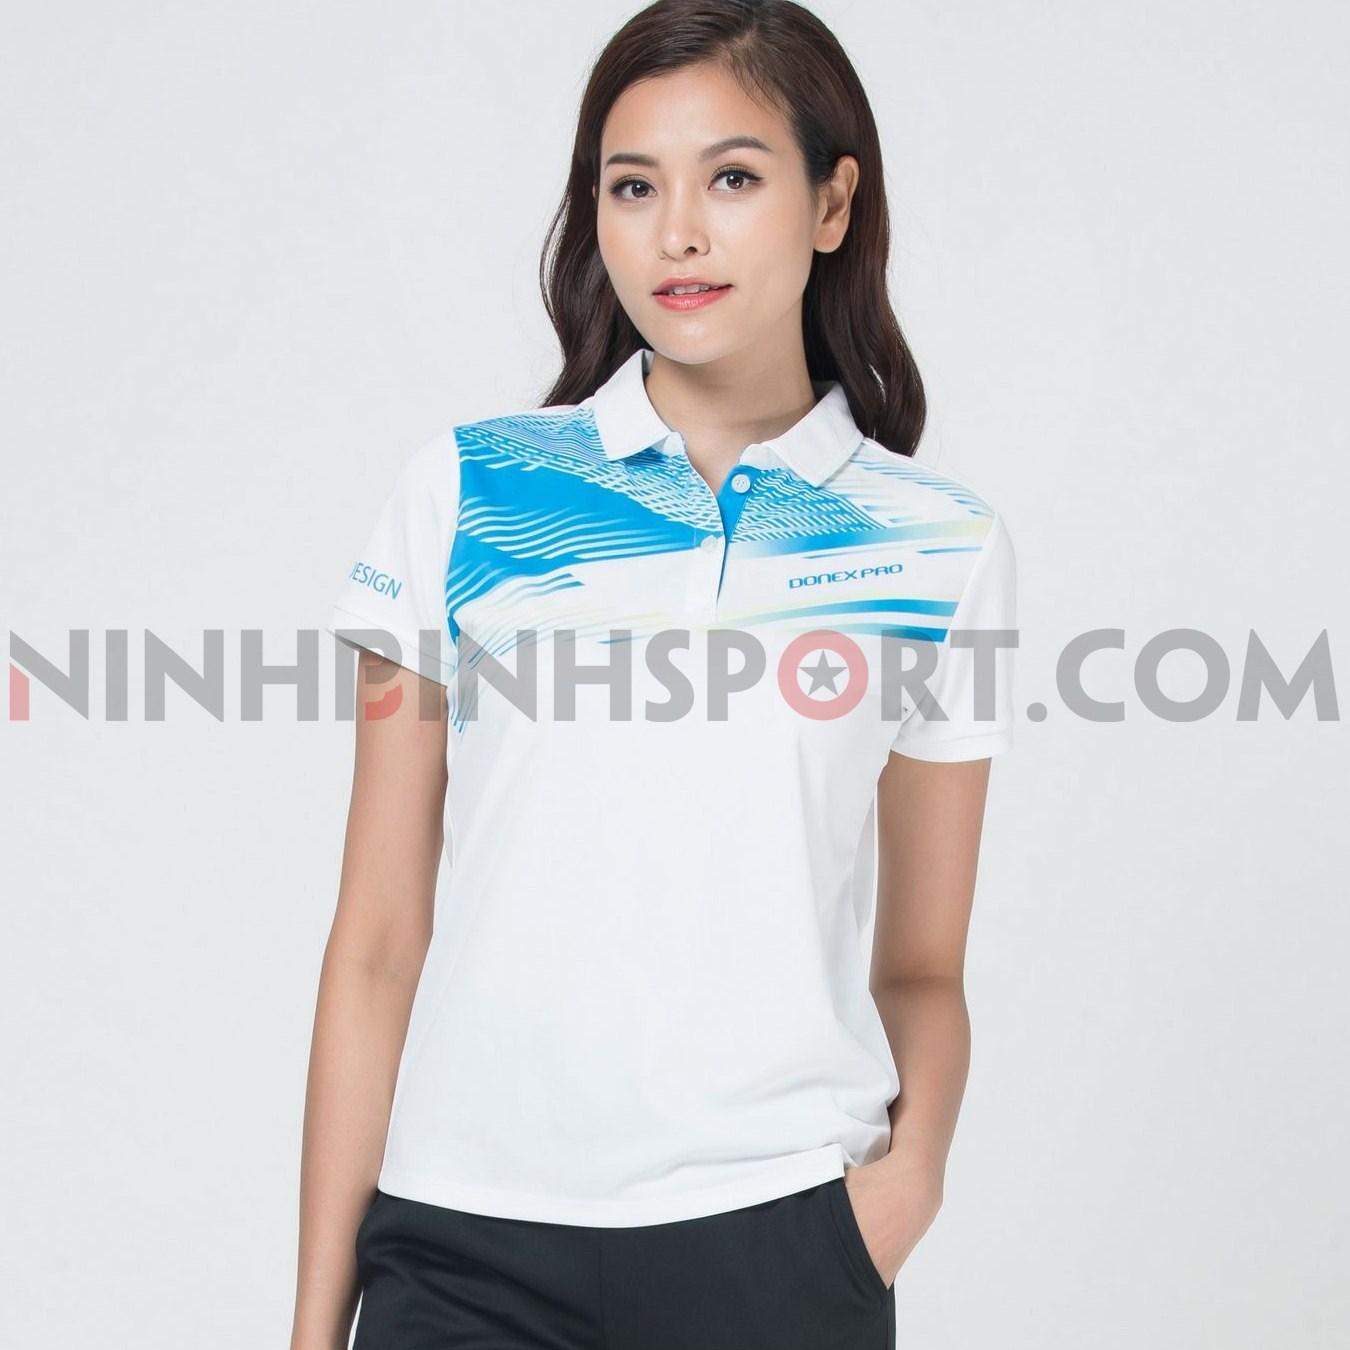 Áo thể thao nữ Donex AC-3380-01-02